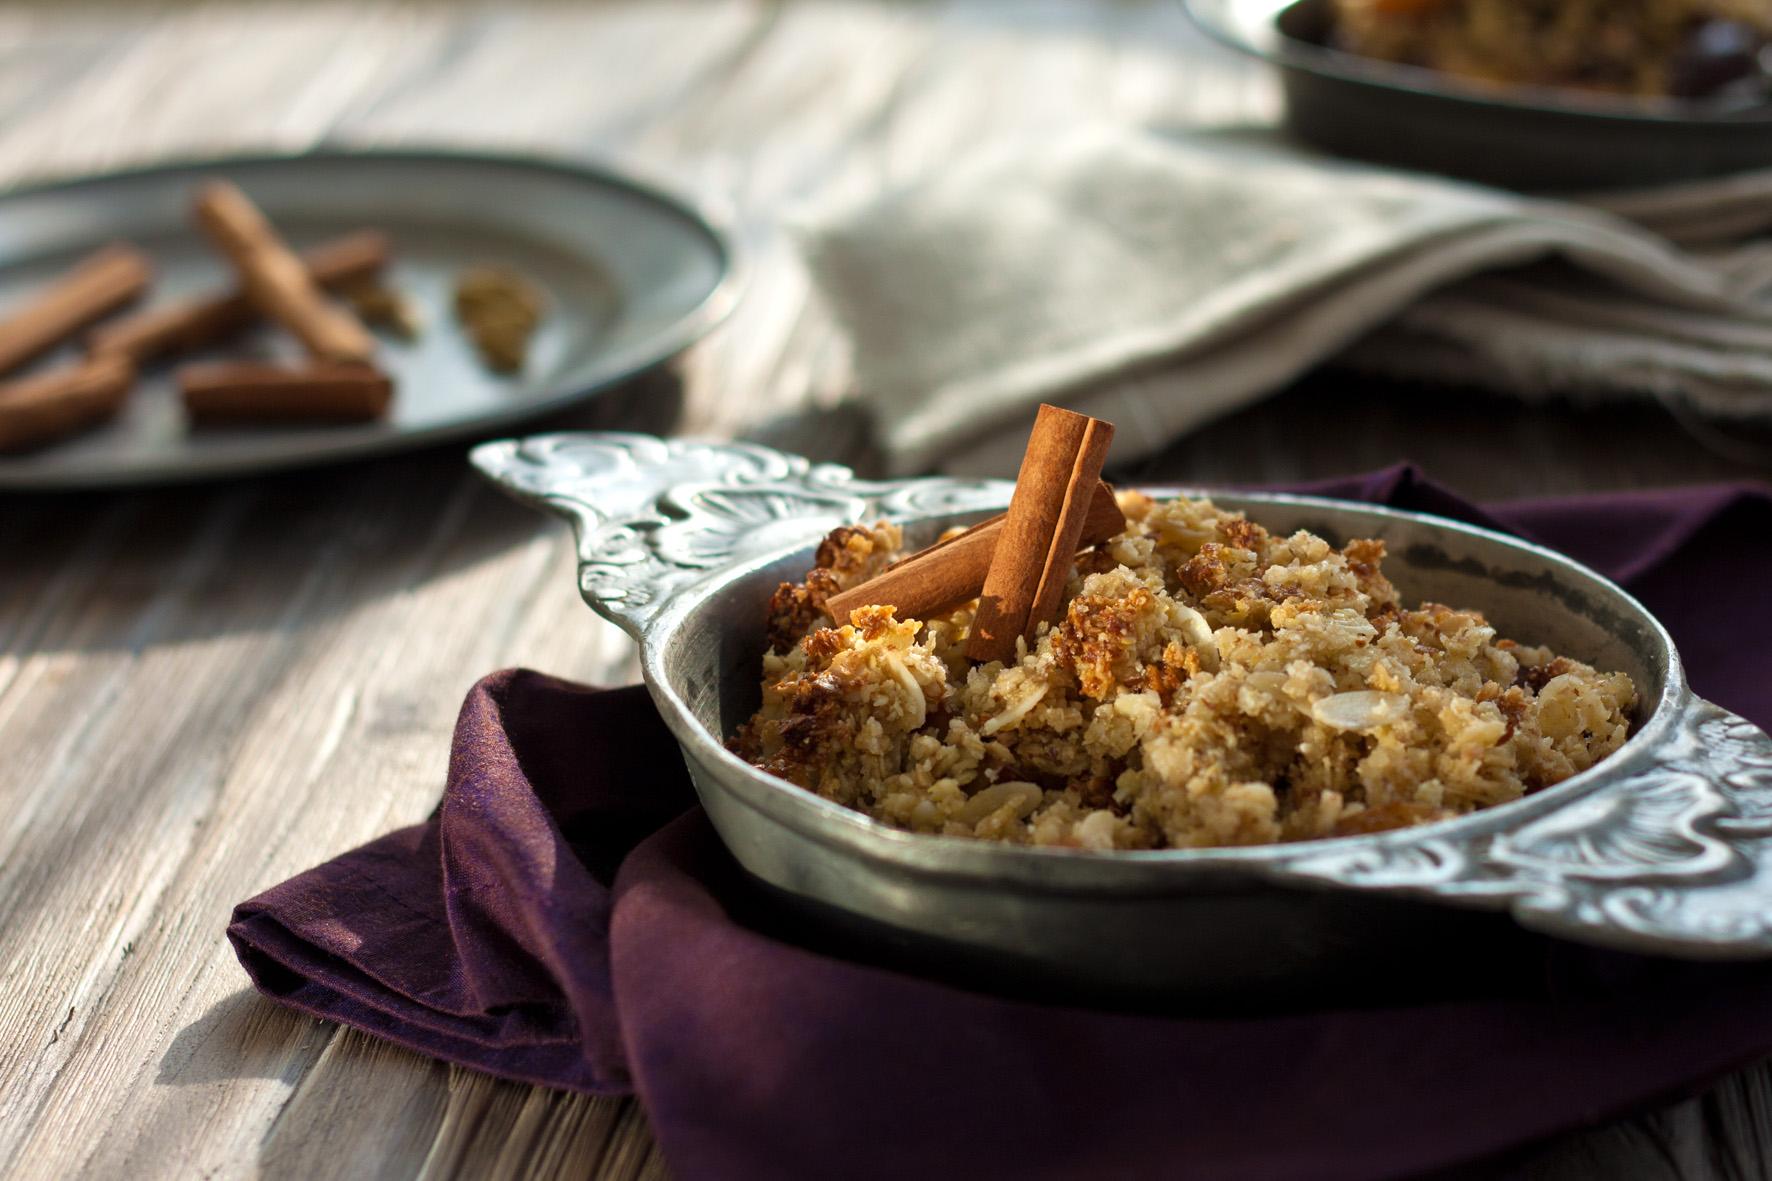 Pflaumen-Crumble-Quinoa-Buchweizen-8